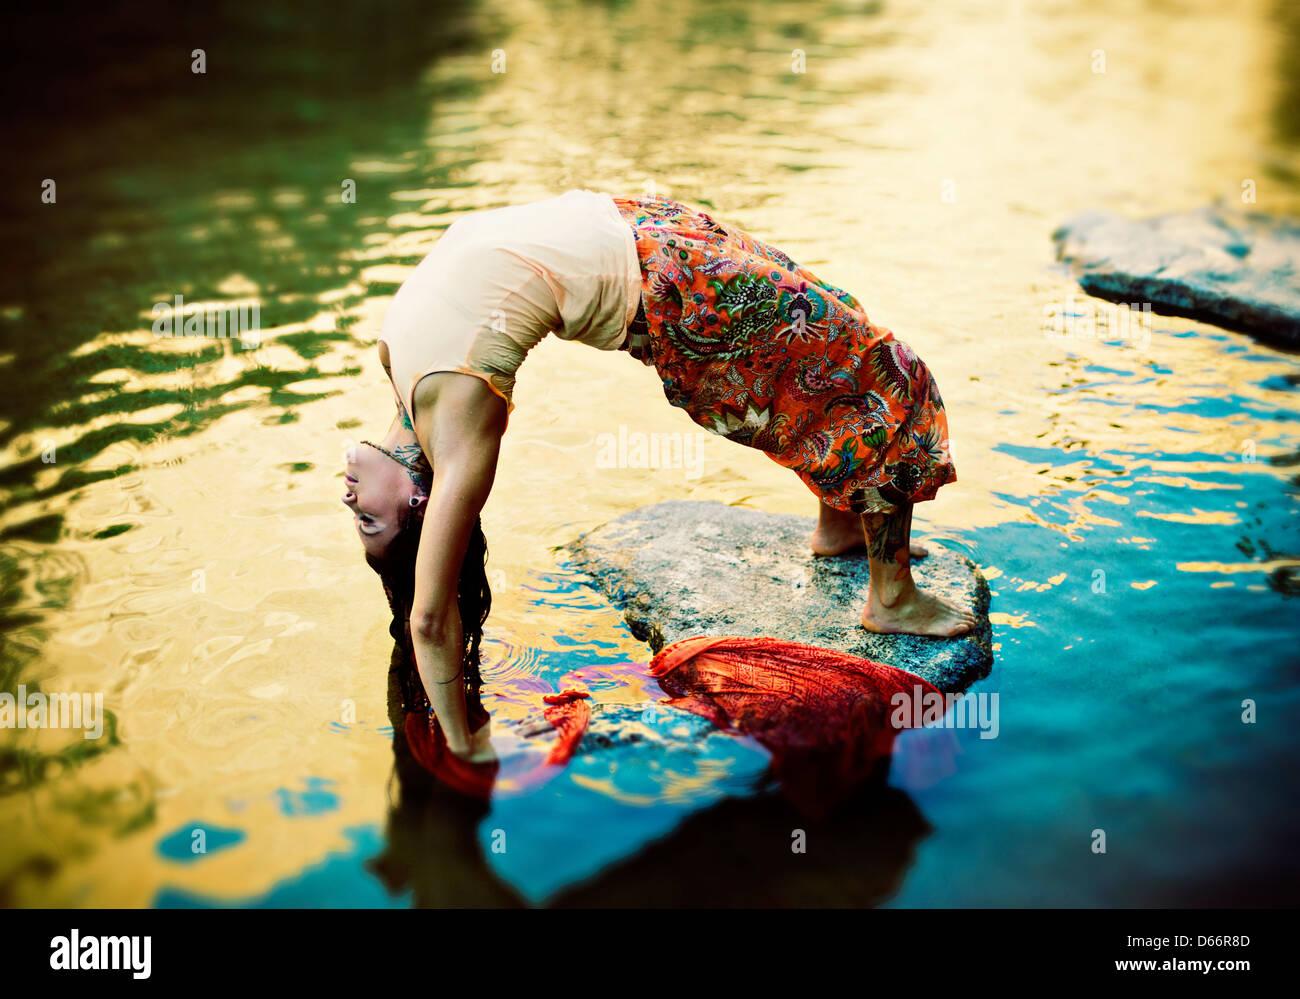 Yoga-Frau im Freien in Yoga pose Urdhva Dhanurasana in einem bunten Teich. Stockbild